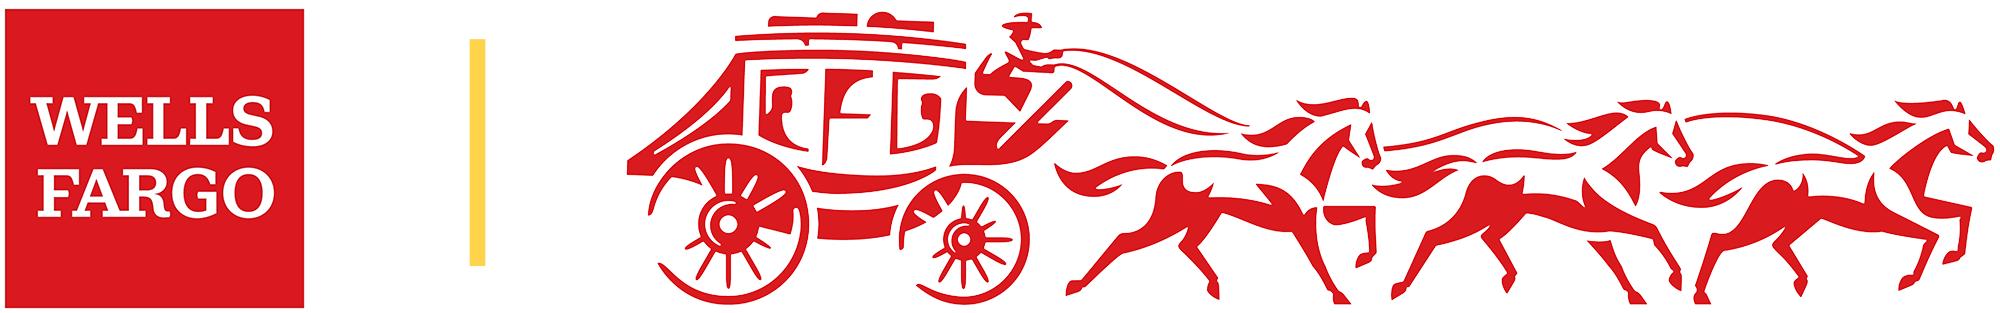 Image result for wells fargo logo image